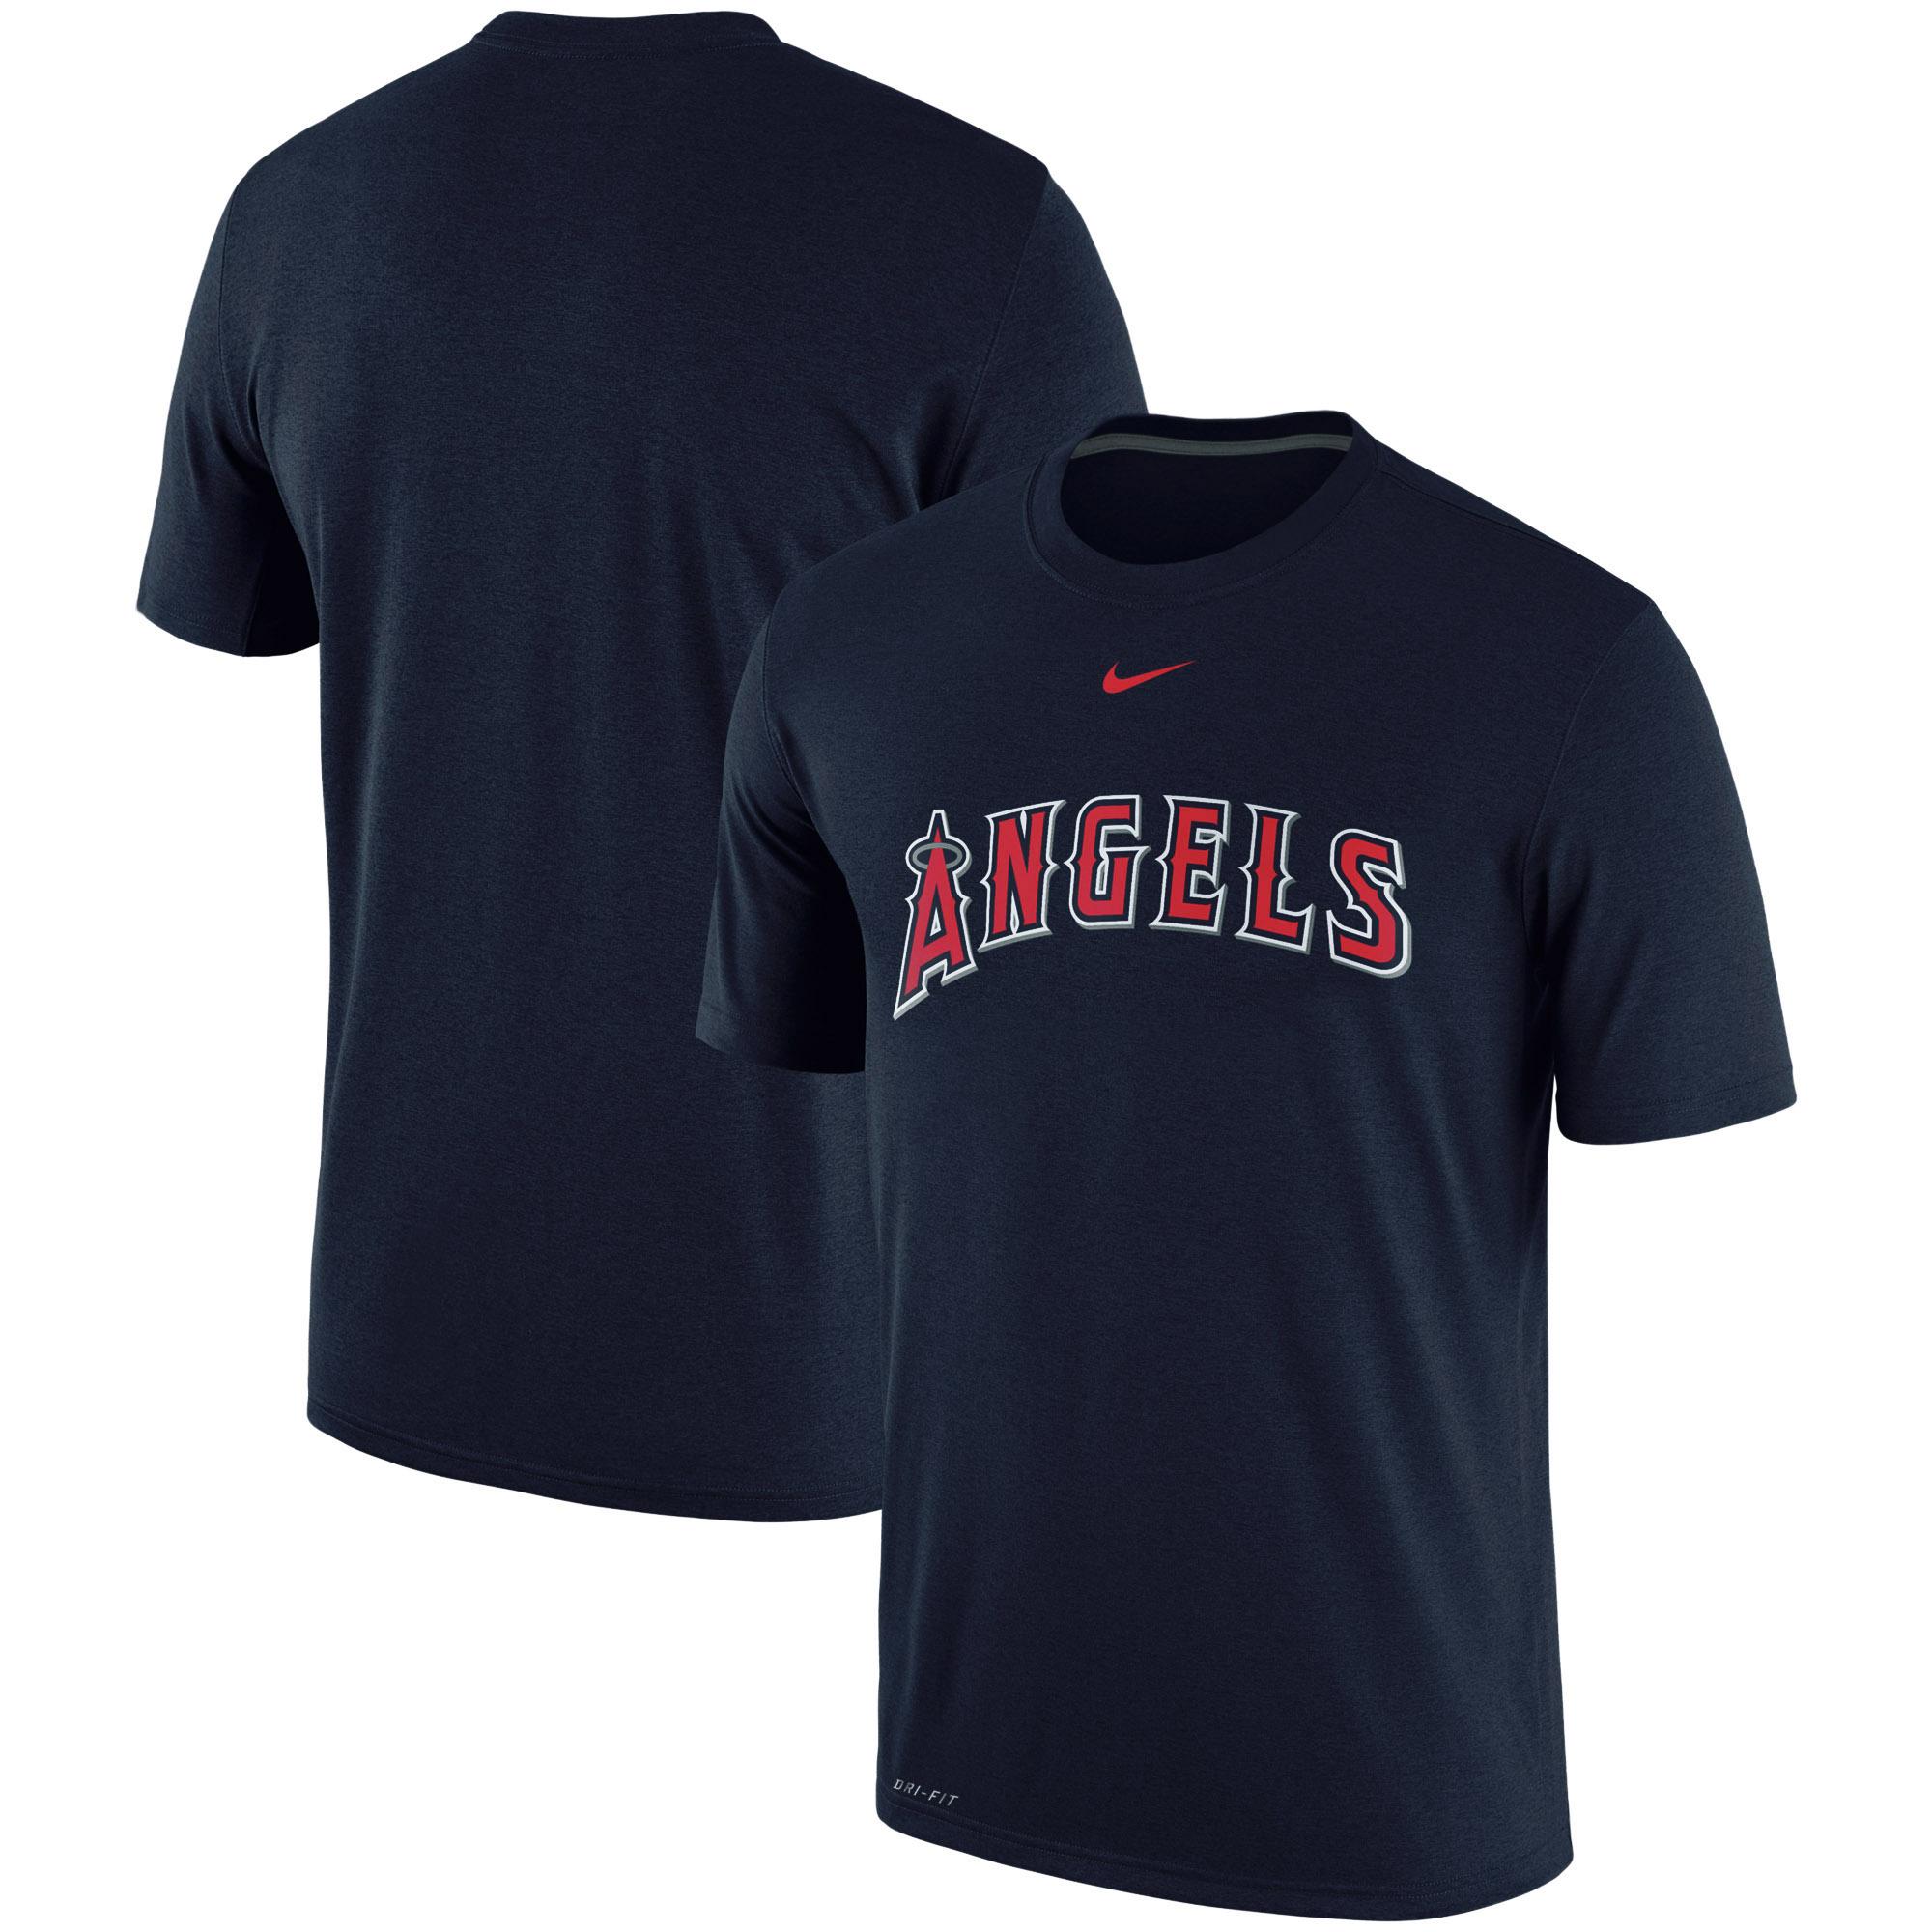 Los Angeles Angels Nike Batting Practice Logo Legend Performance T-Shirt - Navy